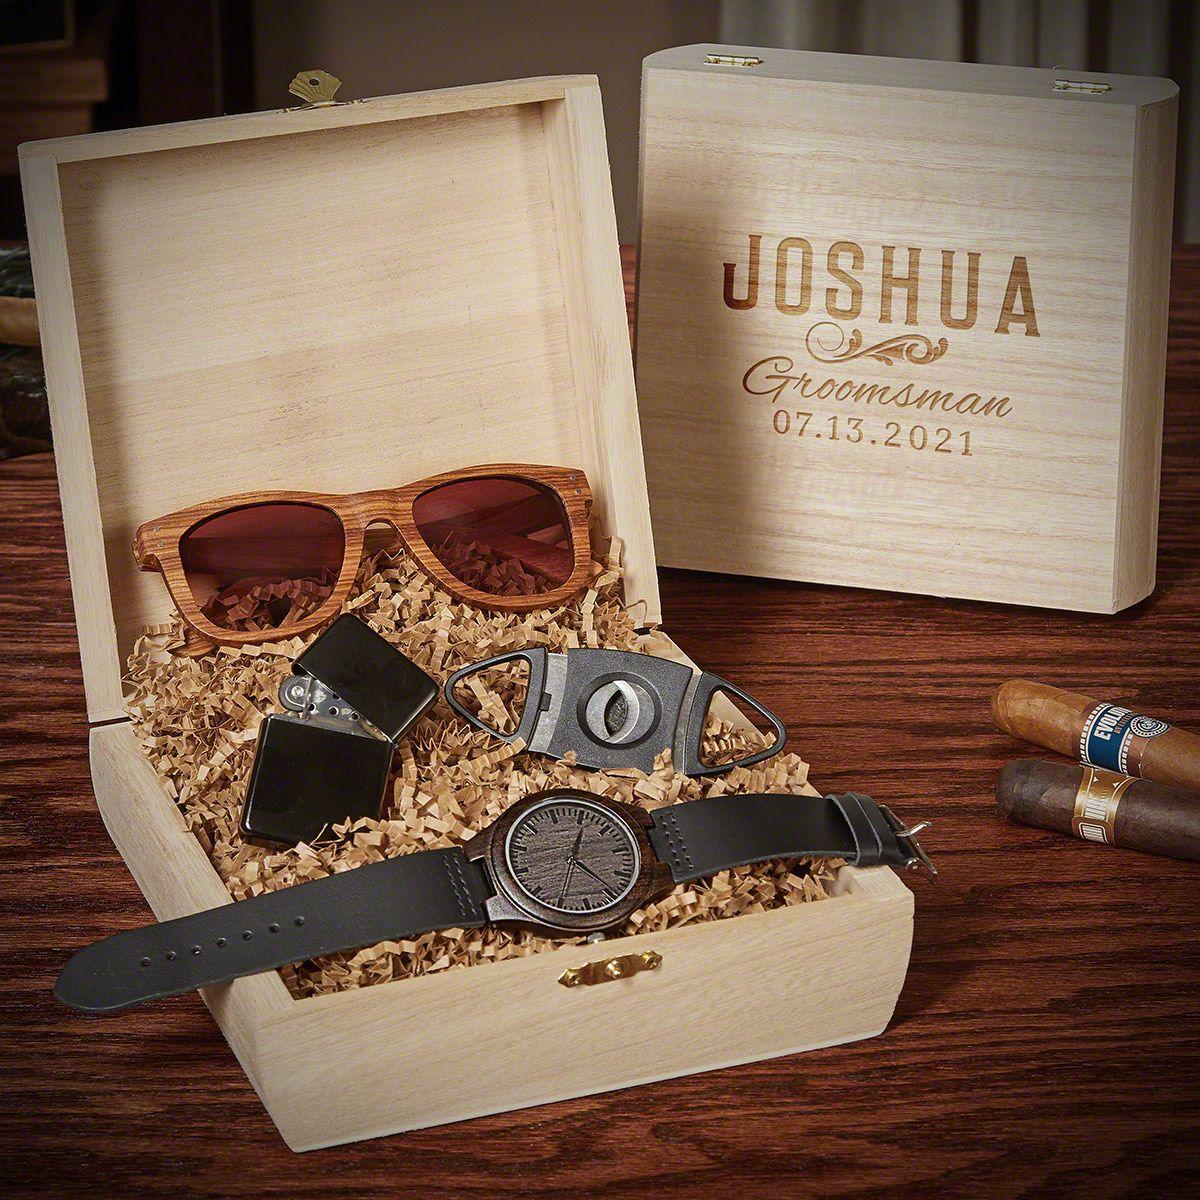 Classic Groomsman Personalized Groomsmen Gift Box